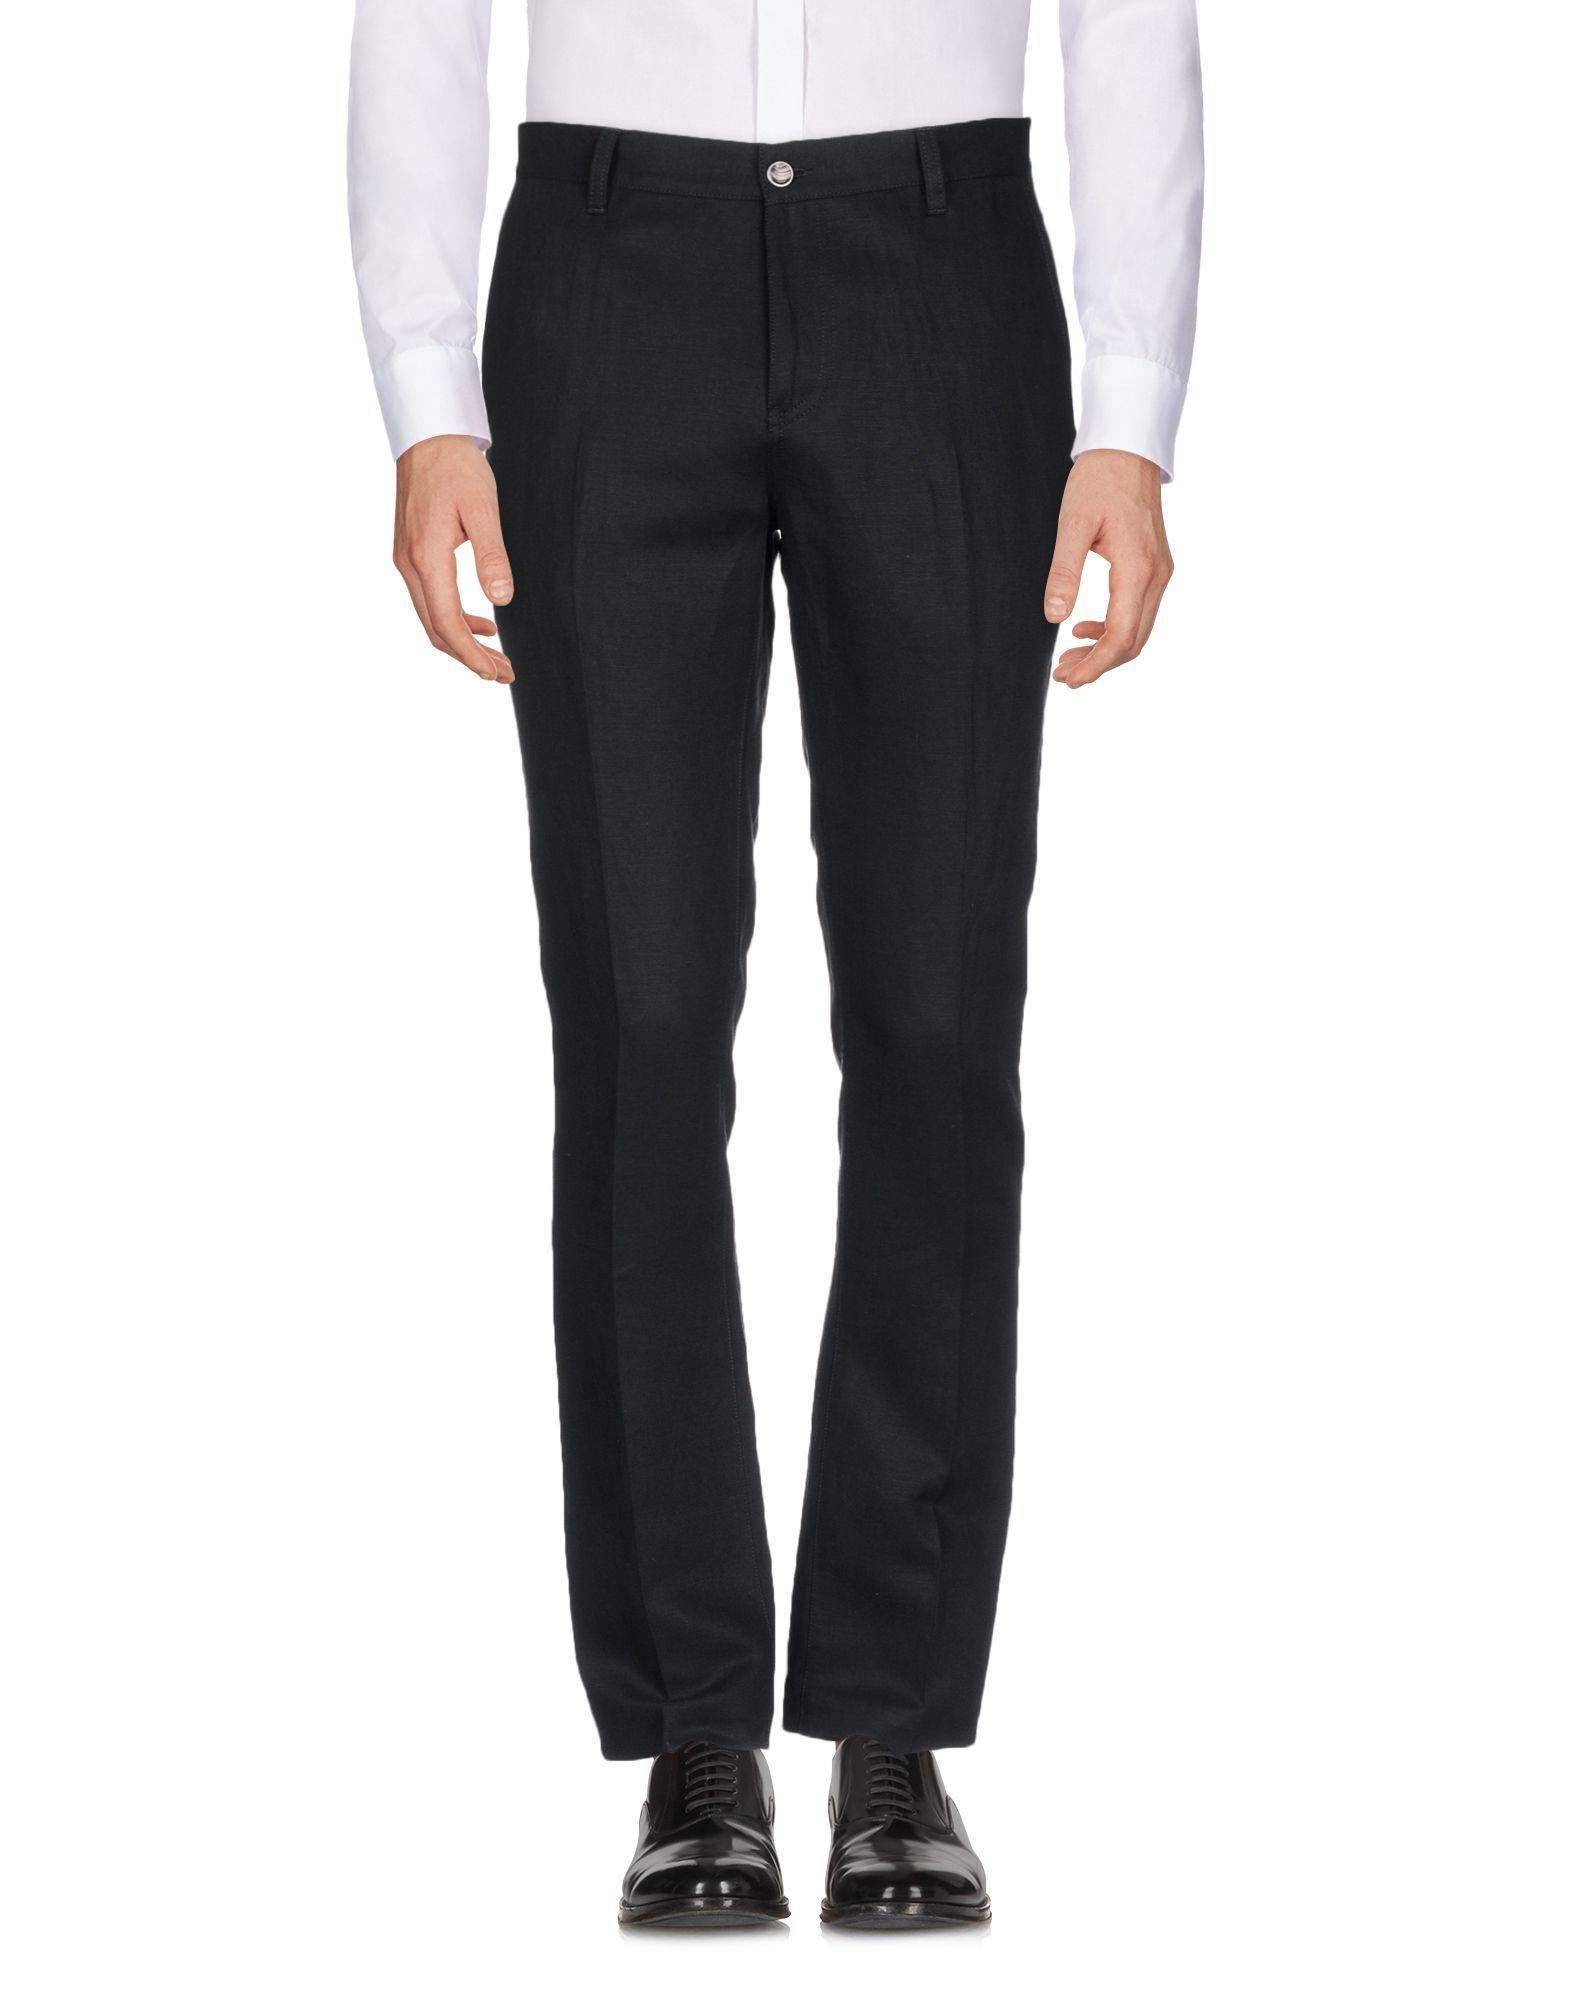 John Varvatos Casual Pants In Black